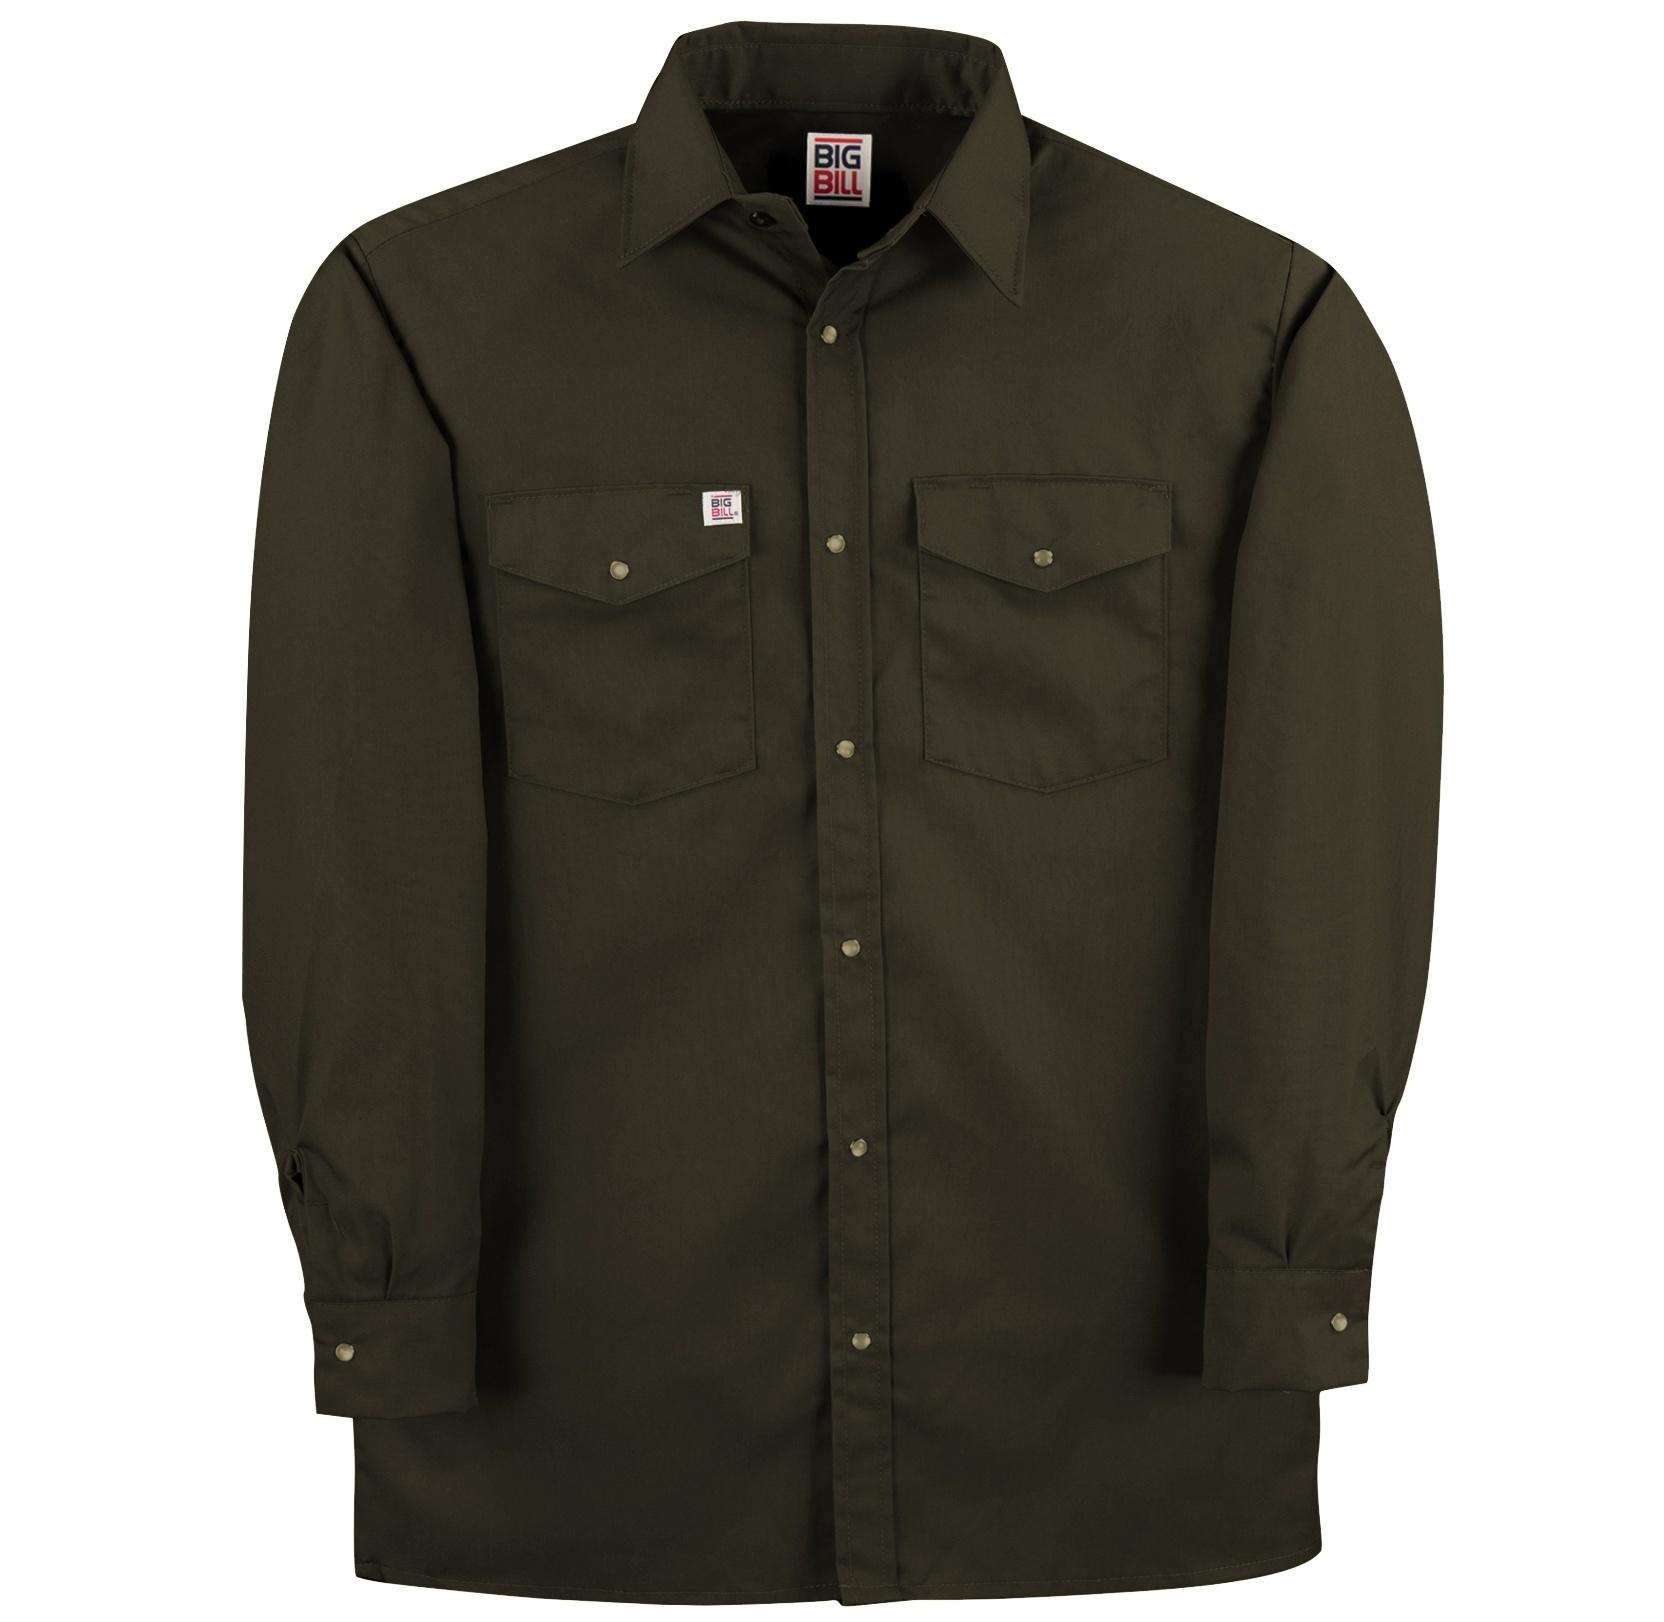 6 oz Twill Snap Closure Long Sleeve Work Shirt-BIG BILL